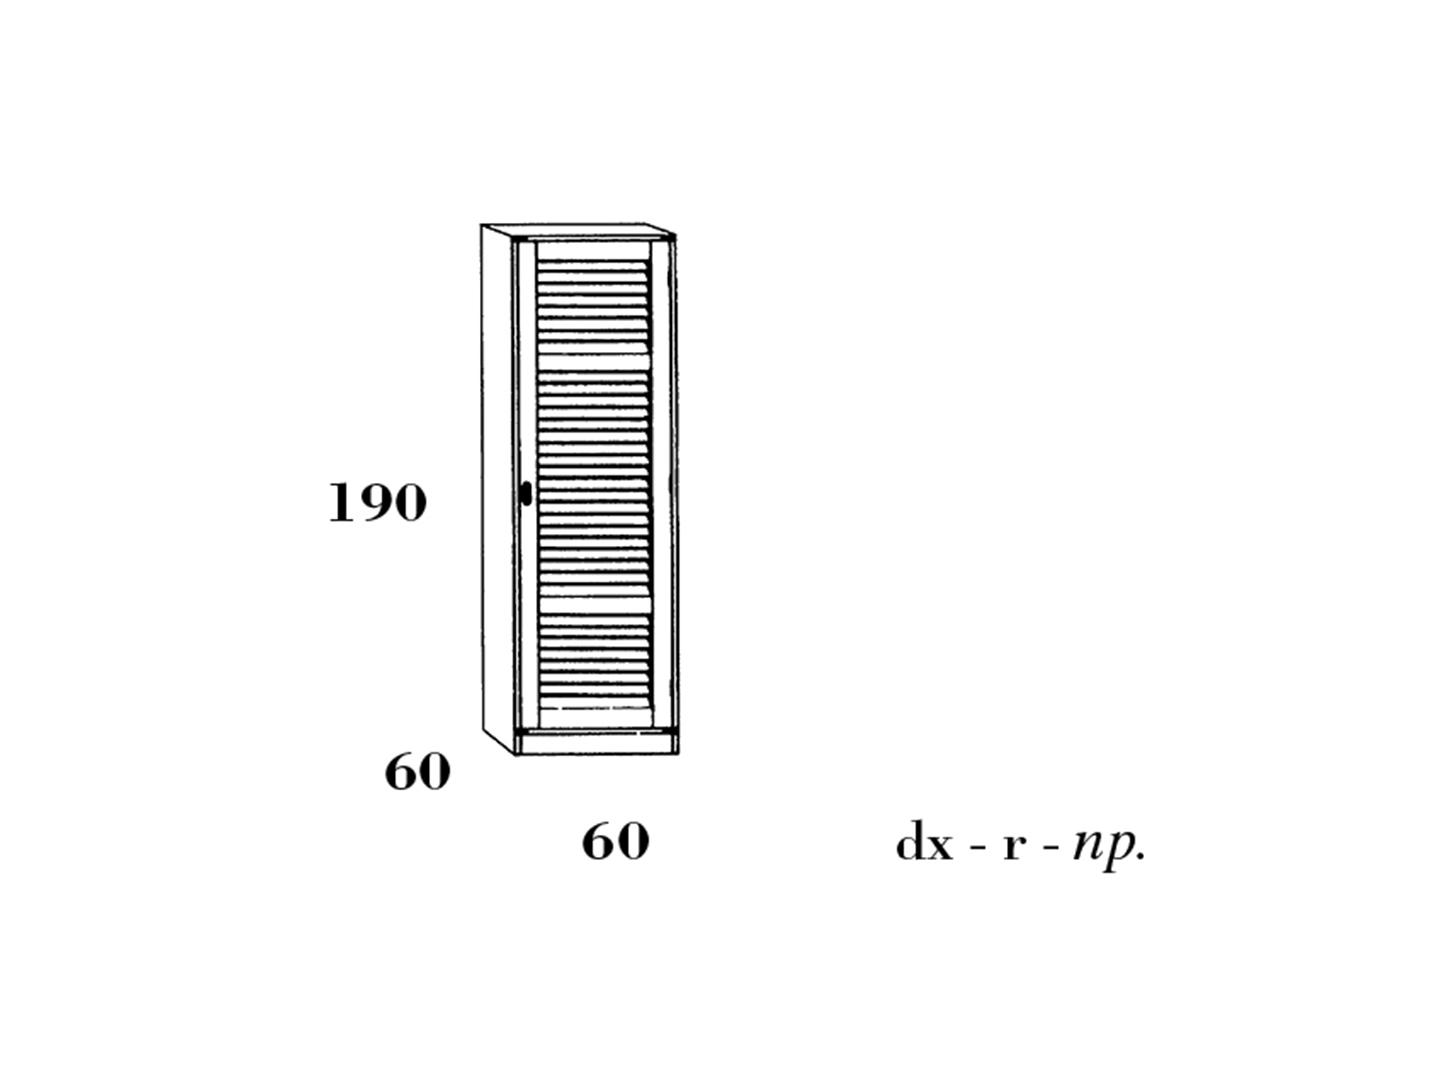 proposta 211   caroti - Armadio A Ponte Centrale E Libreria